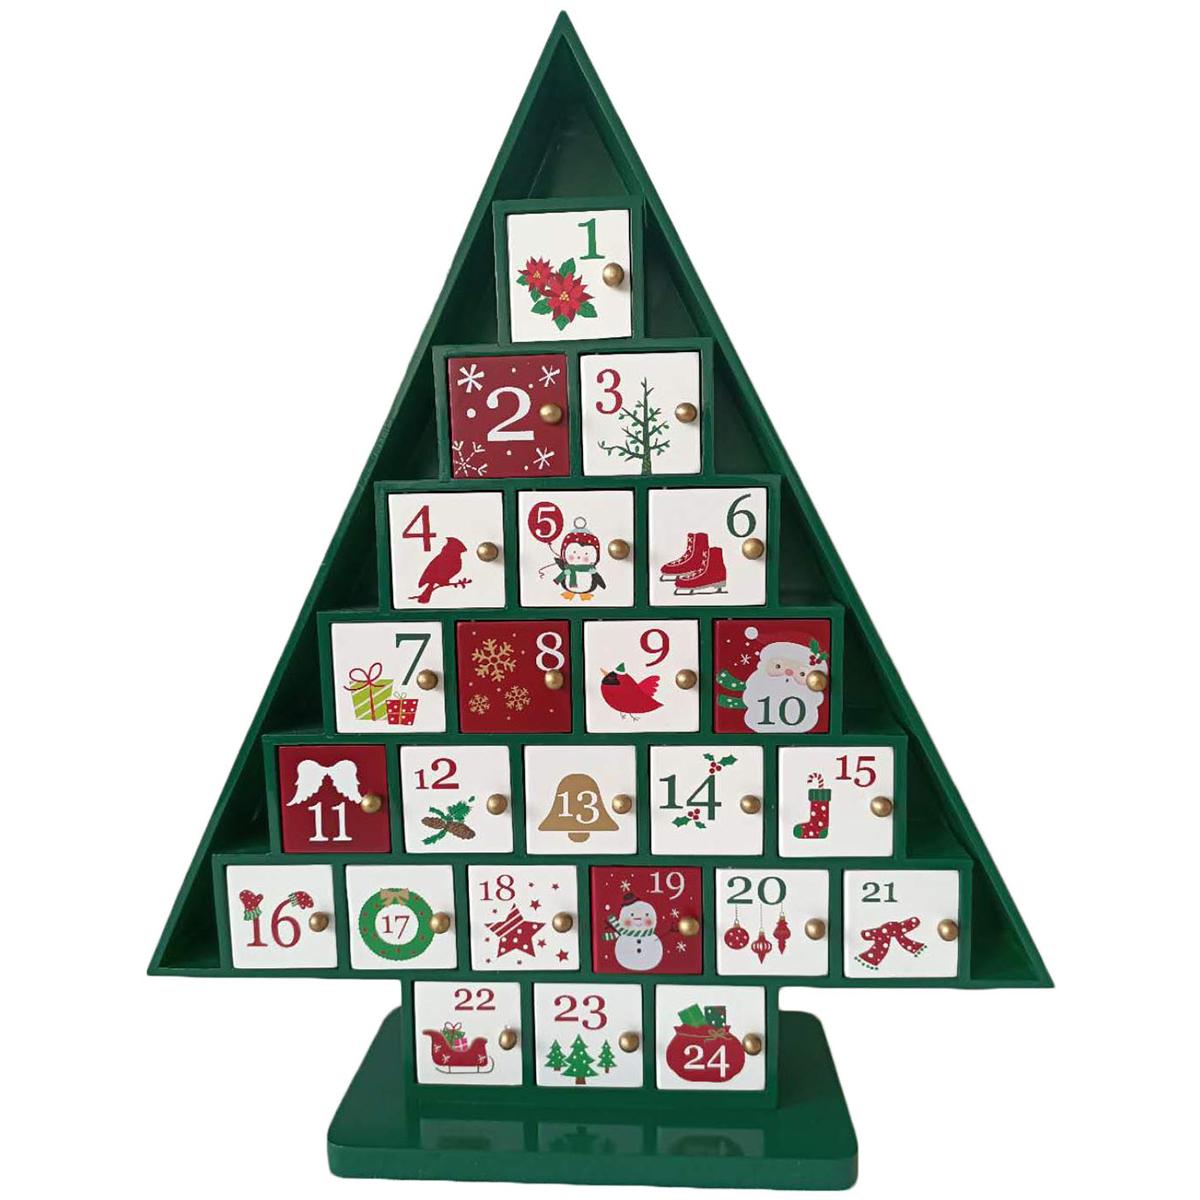 Wooden Christmas Tree Advent Calendar Costco Australia